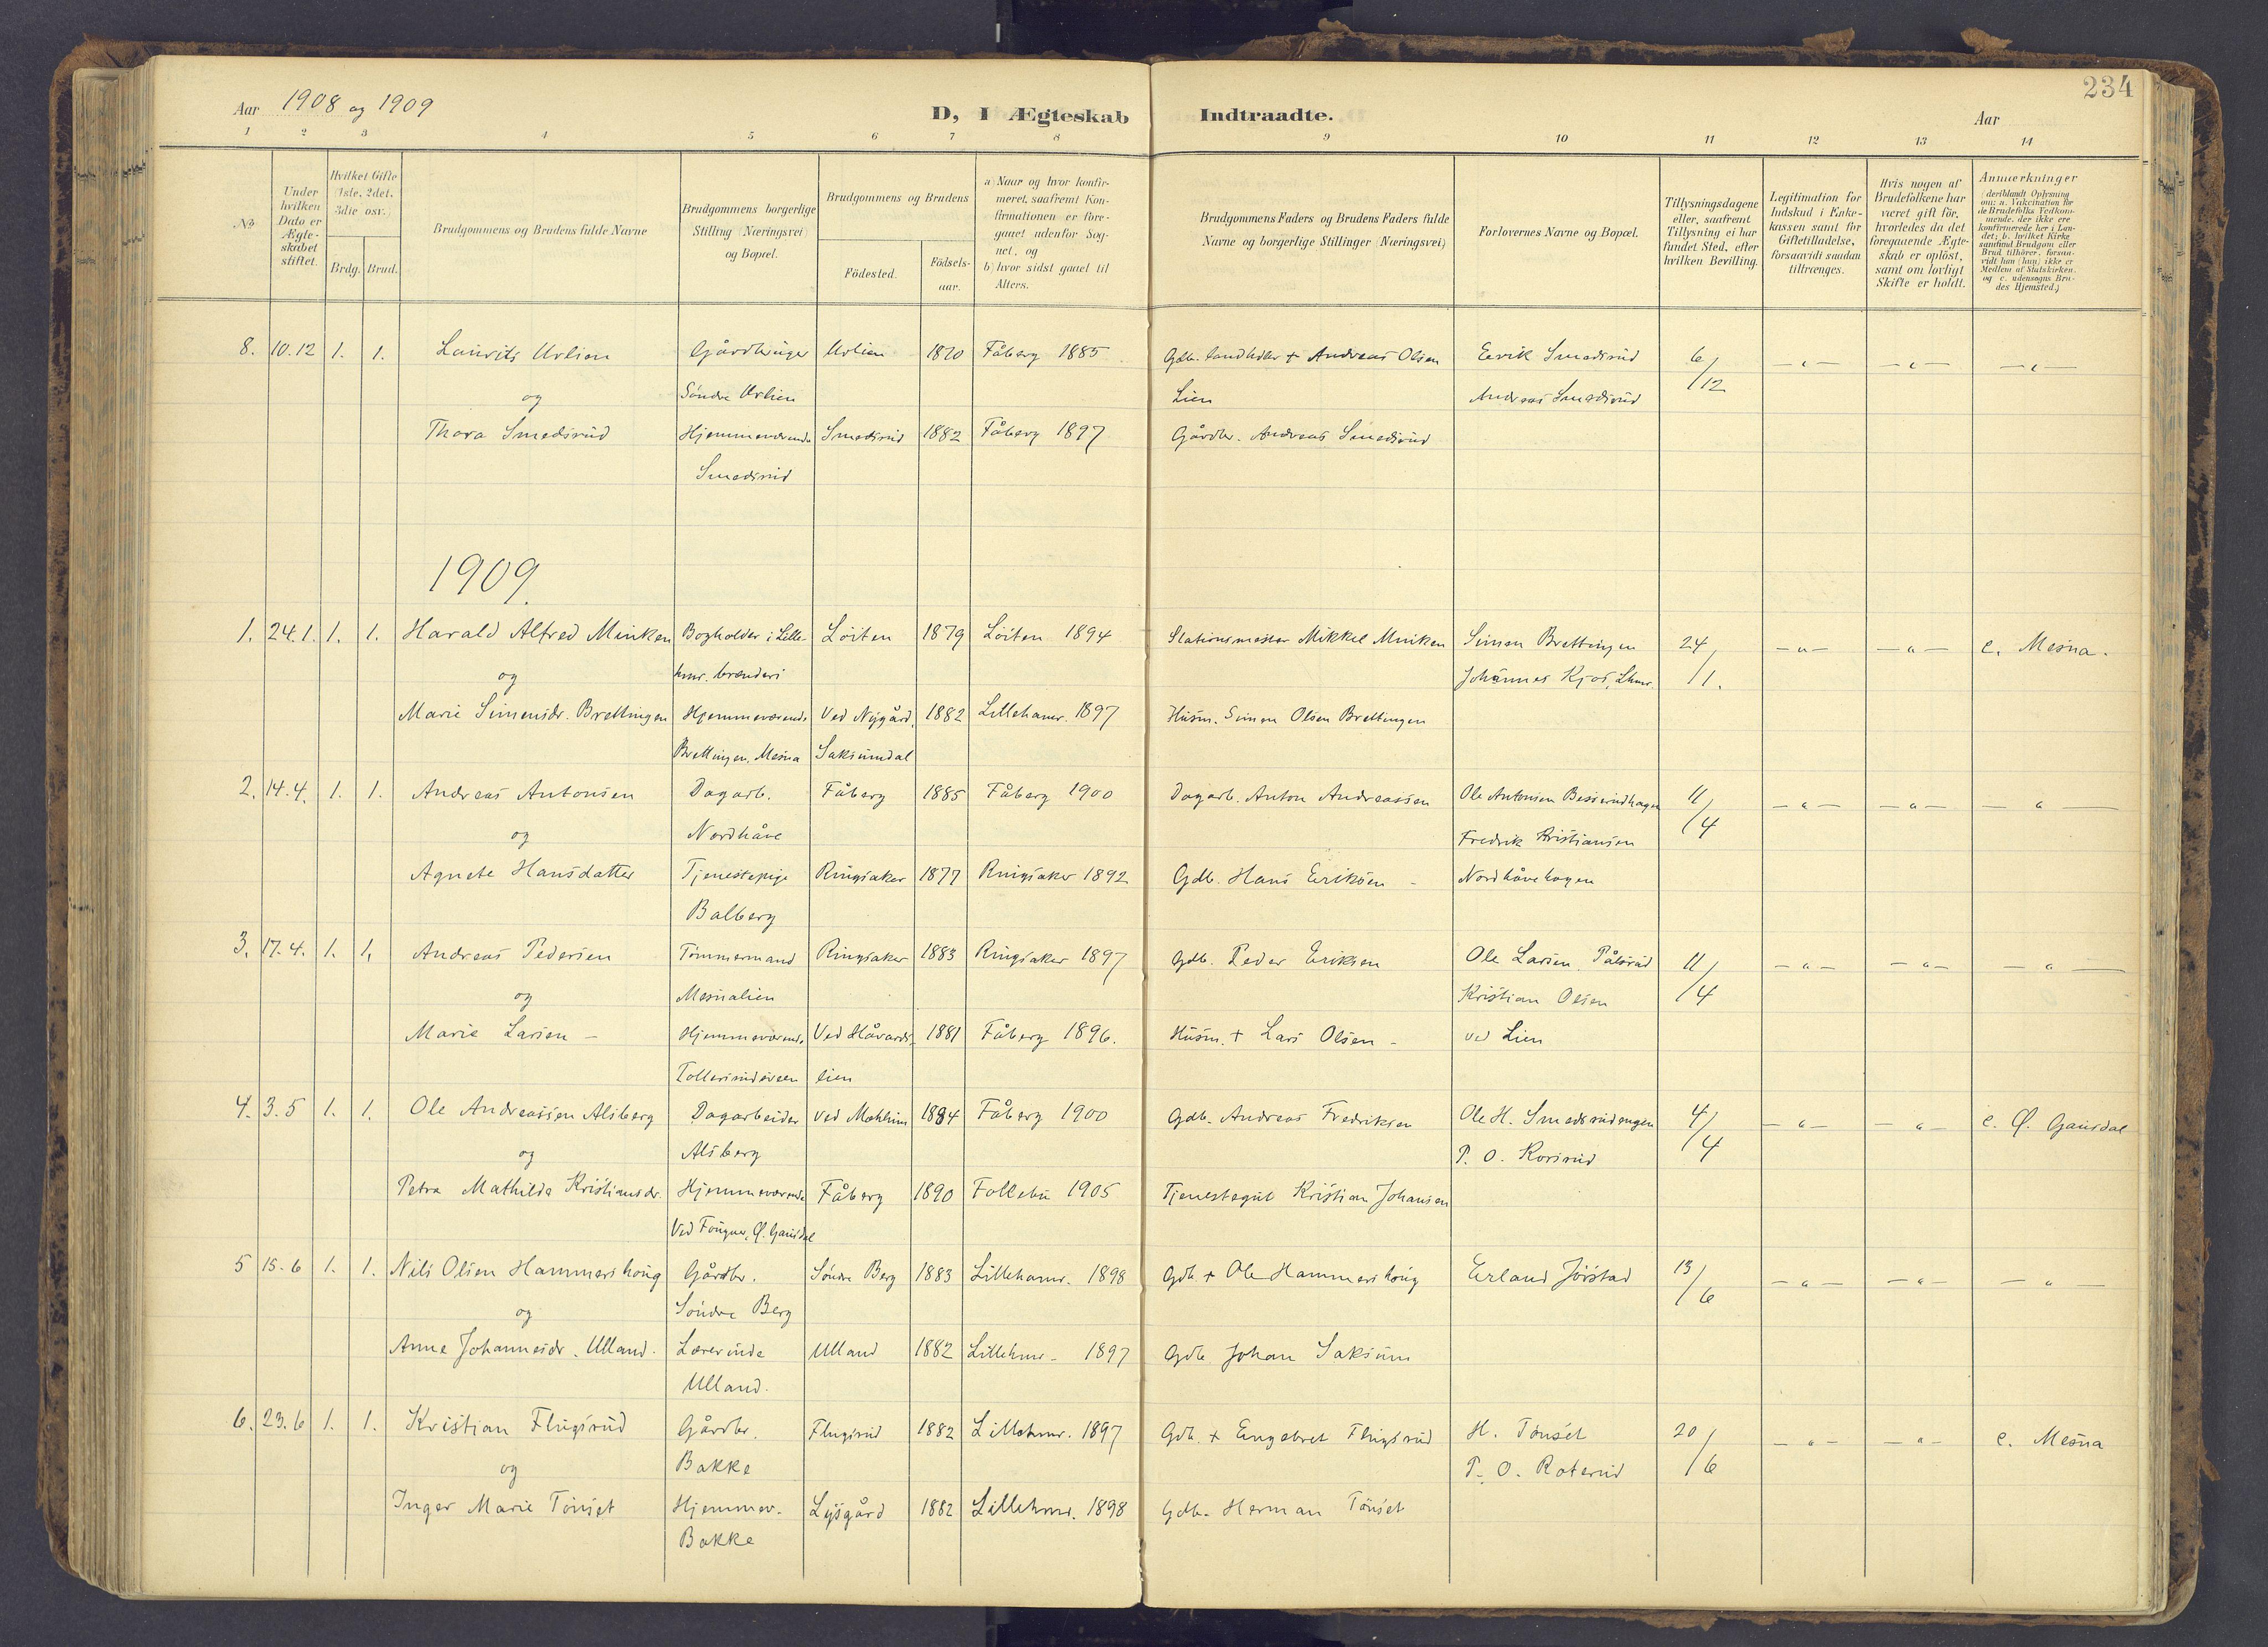 SAH, Fåberg prestekontor, Ministerialbok nr. 12, 1899-1915, s. 234